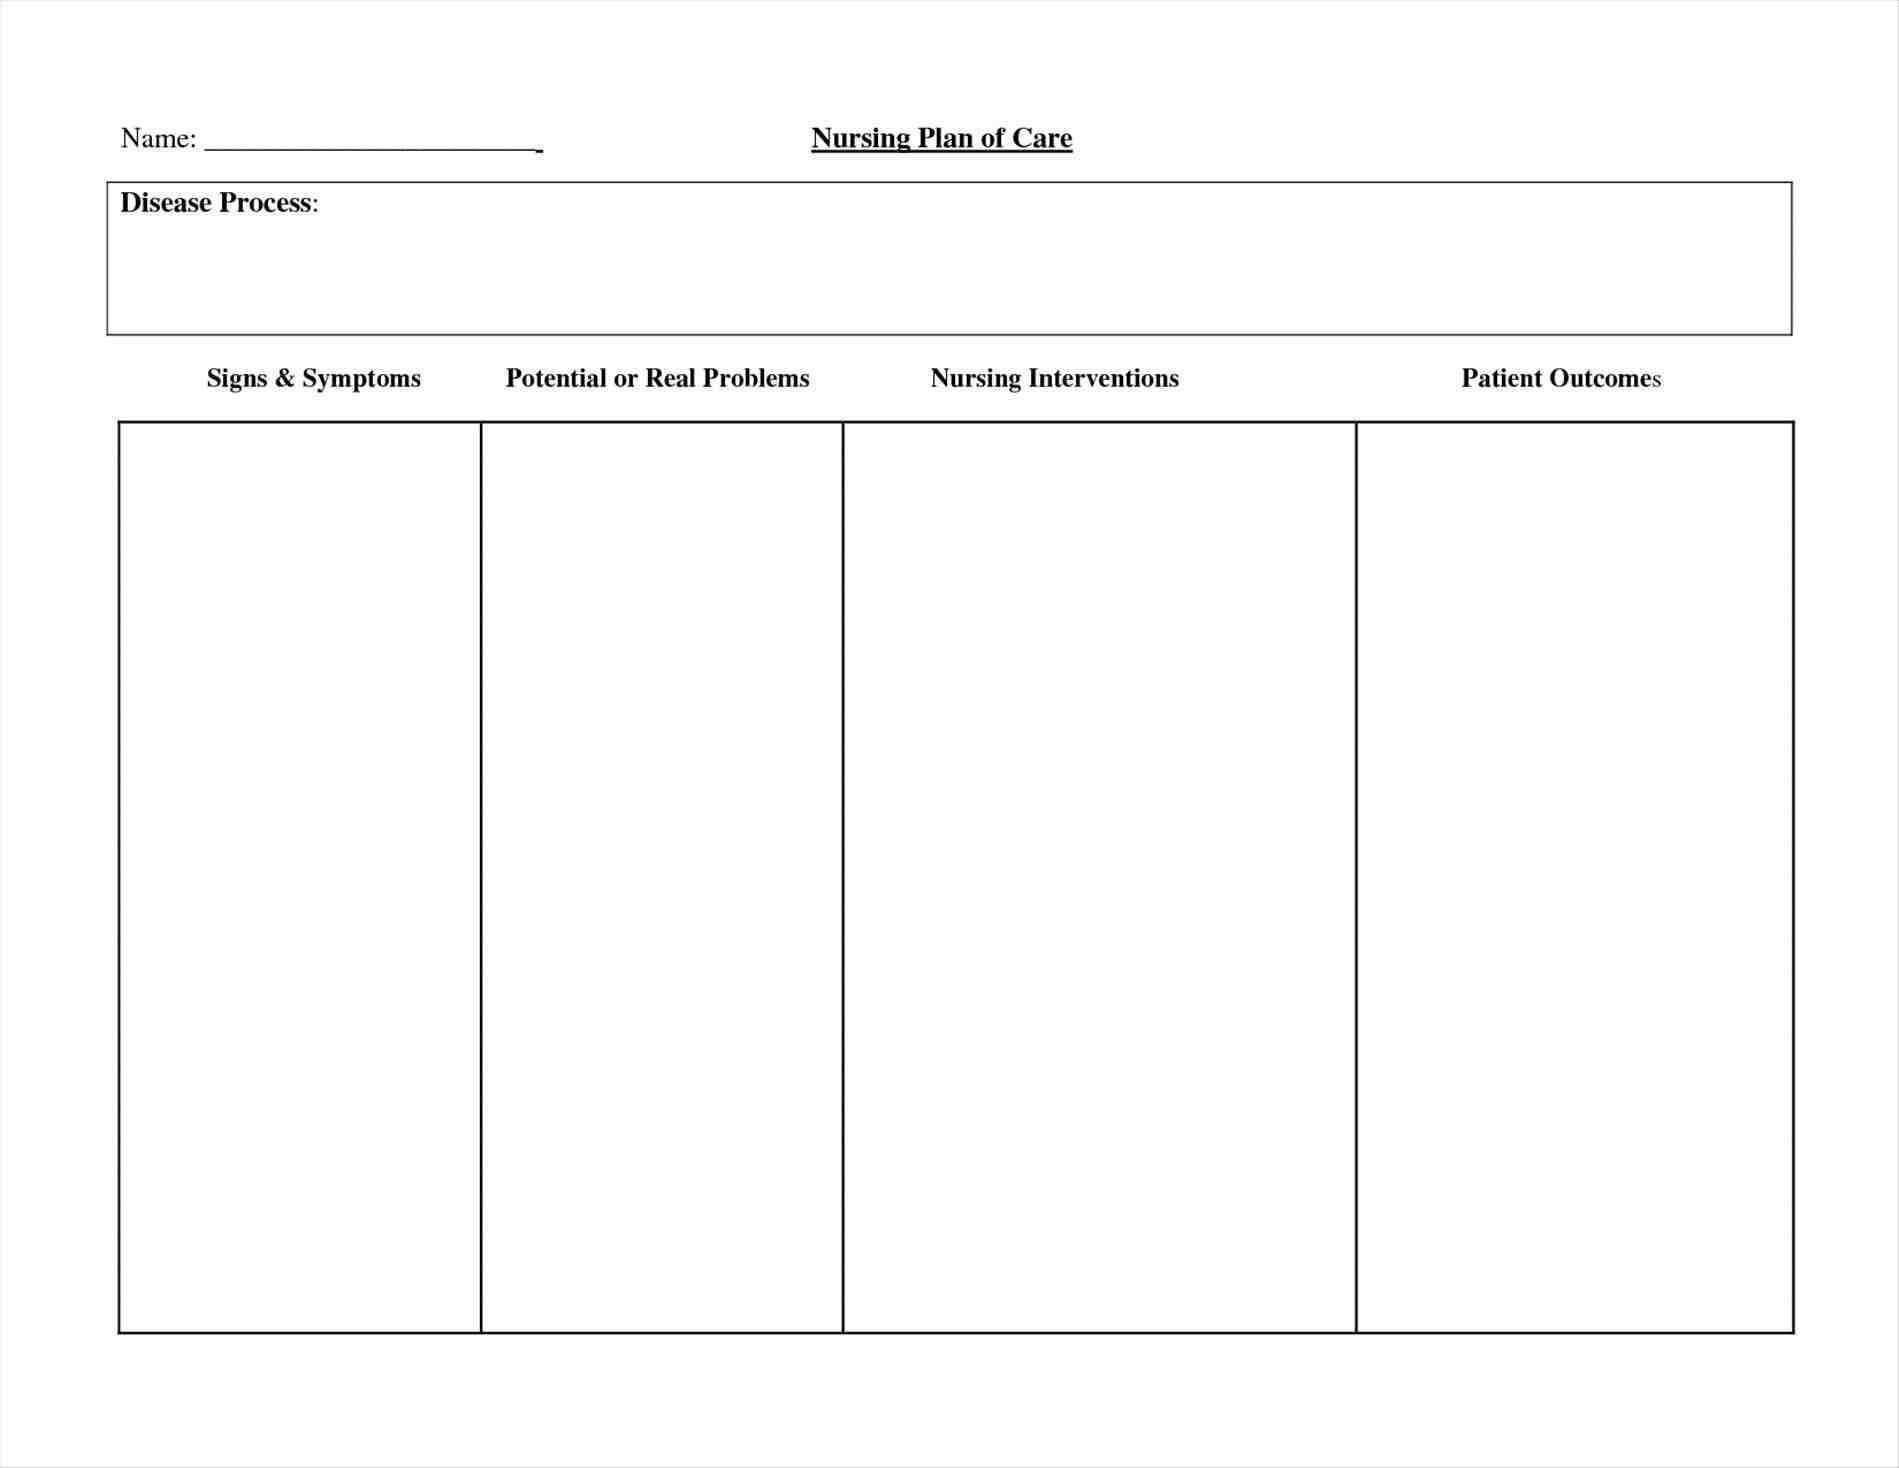 012 Nursing Care Plan Templates Blank Free Template Art In Nursing Care Plan Templates Blank